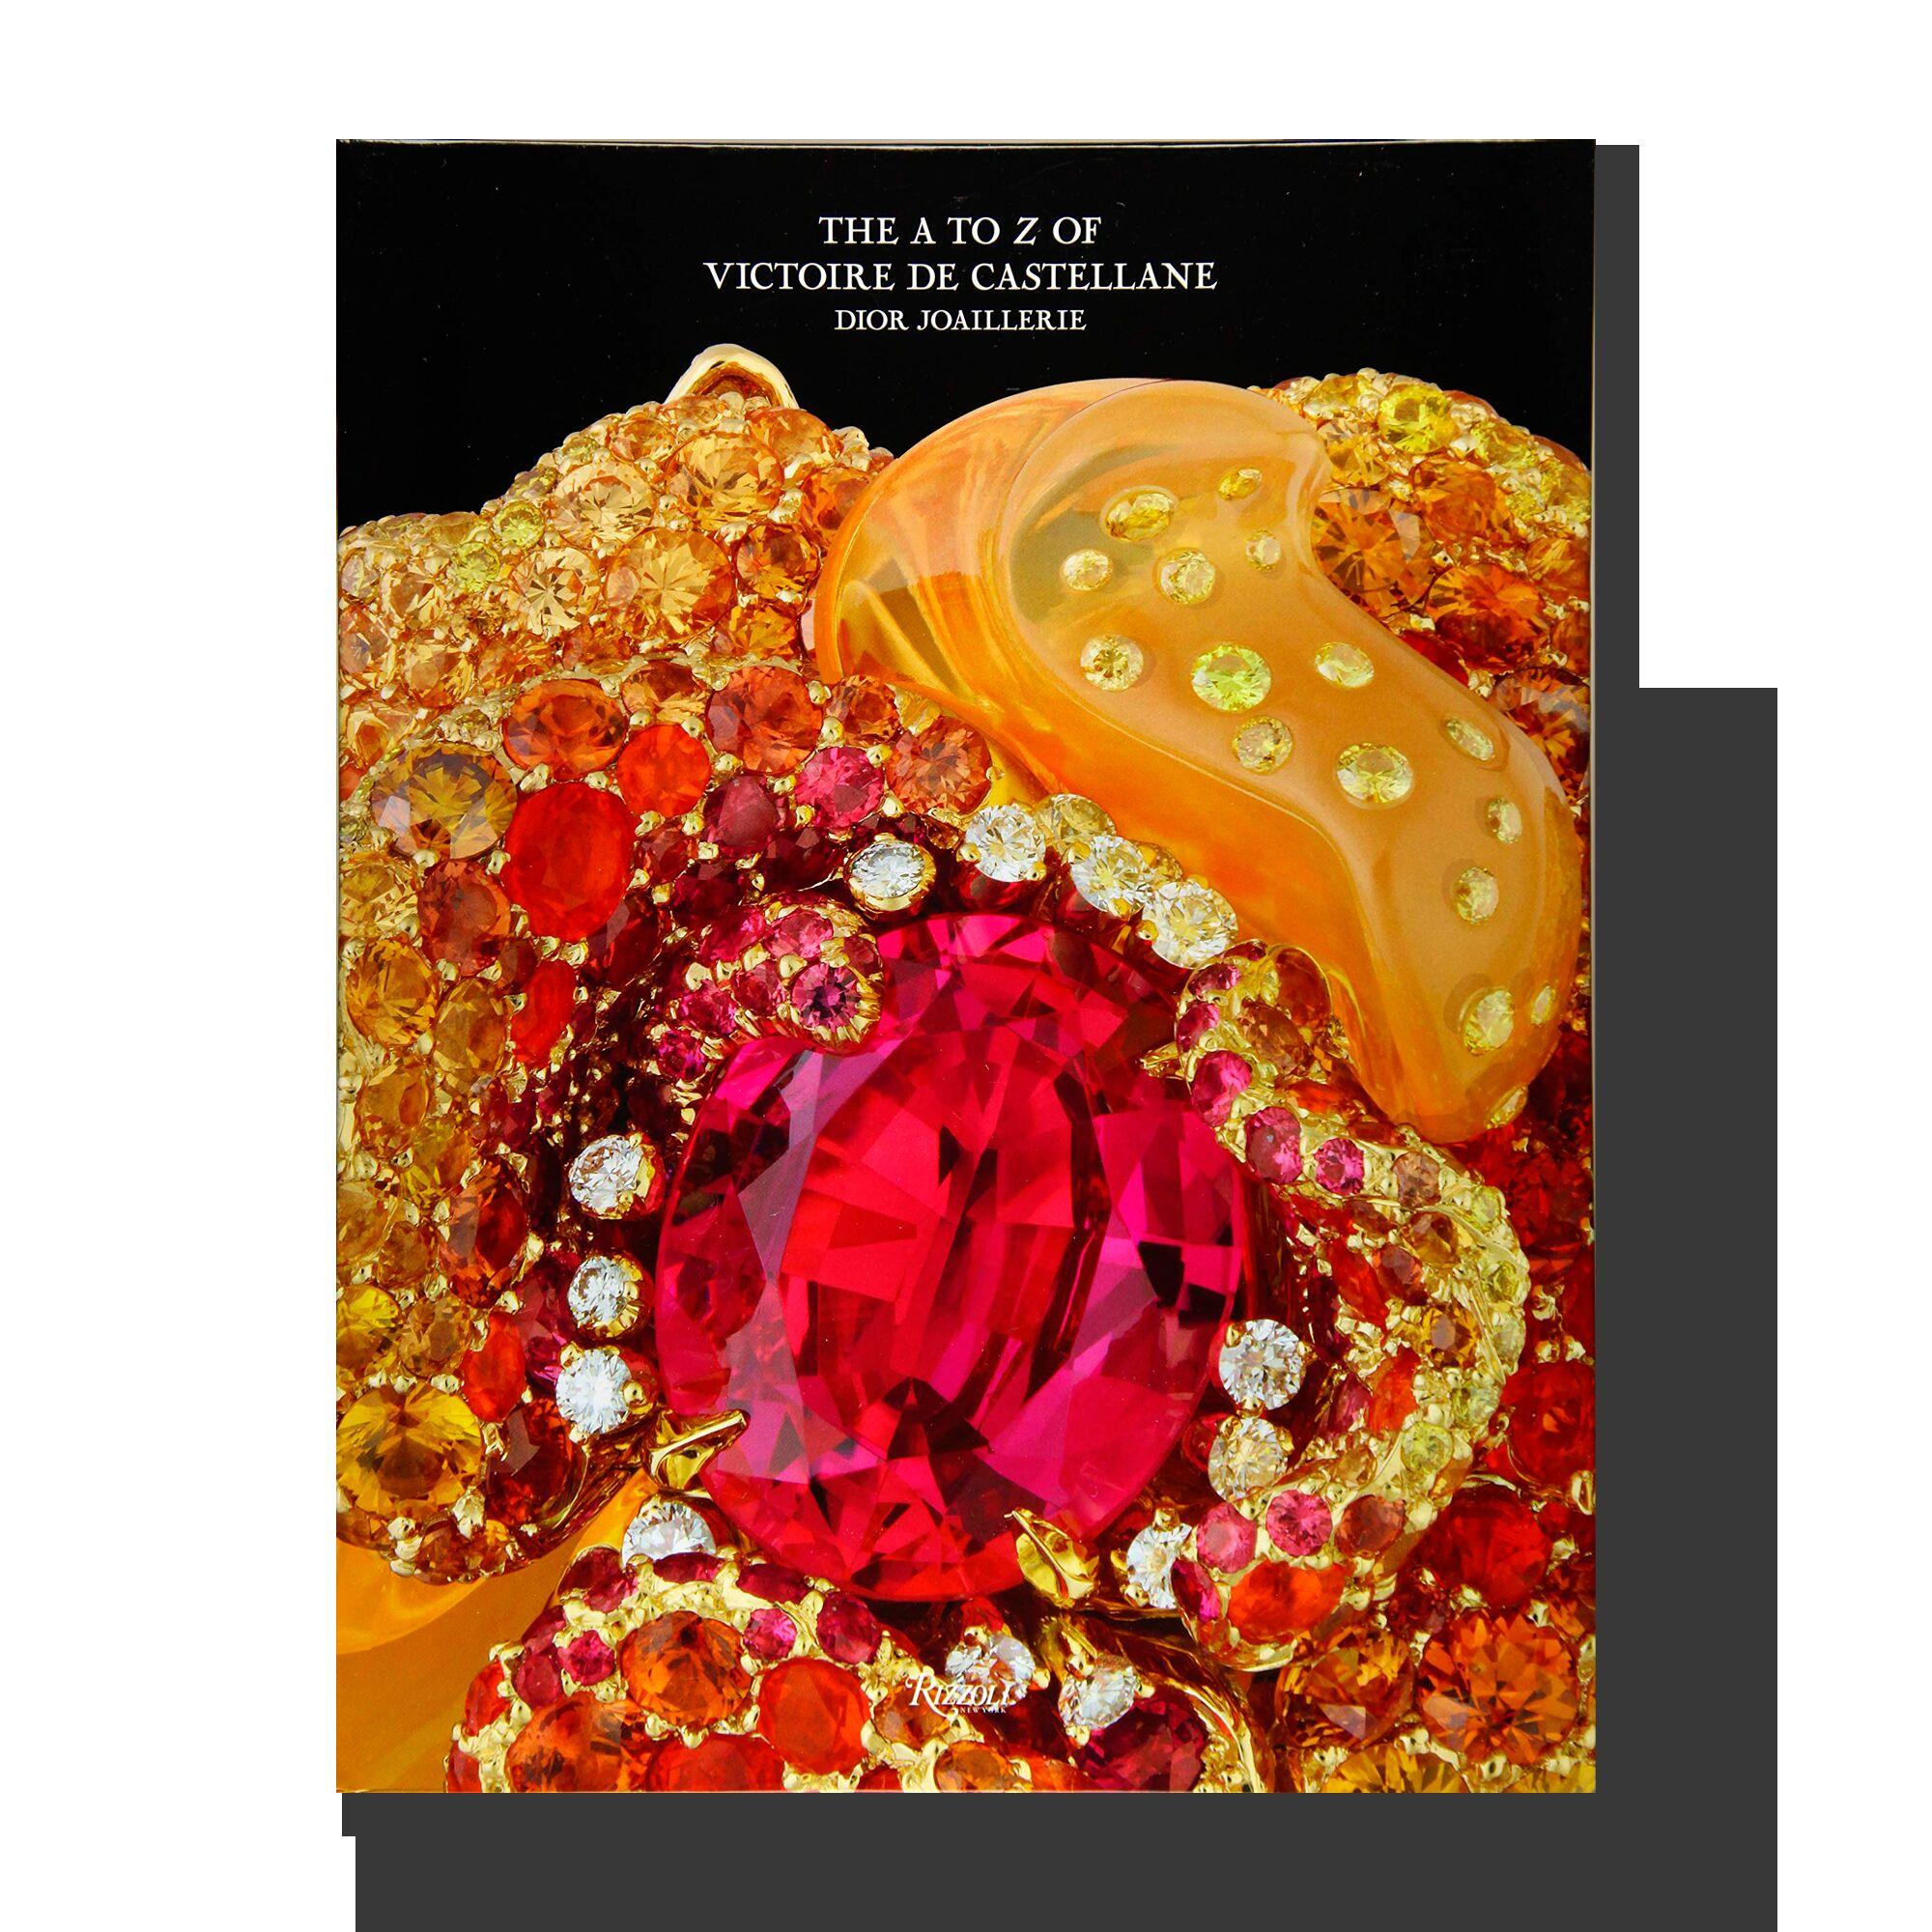 Dior Joaillerie: The Dictionary of Victoire de Castellane